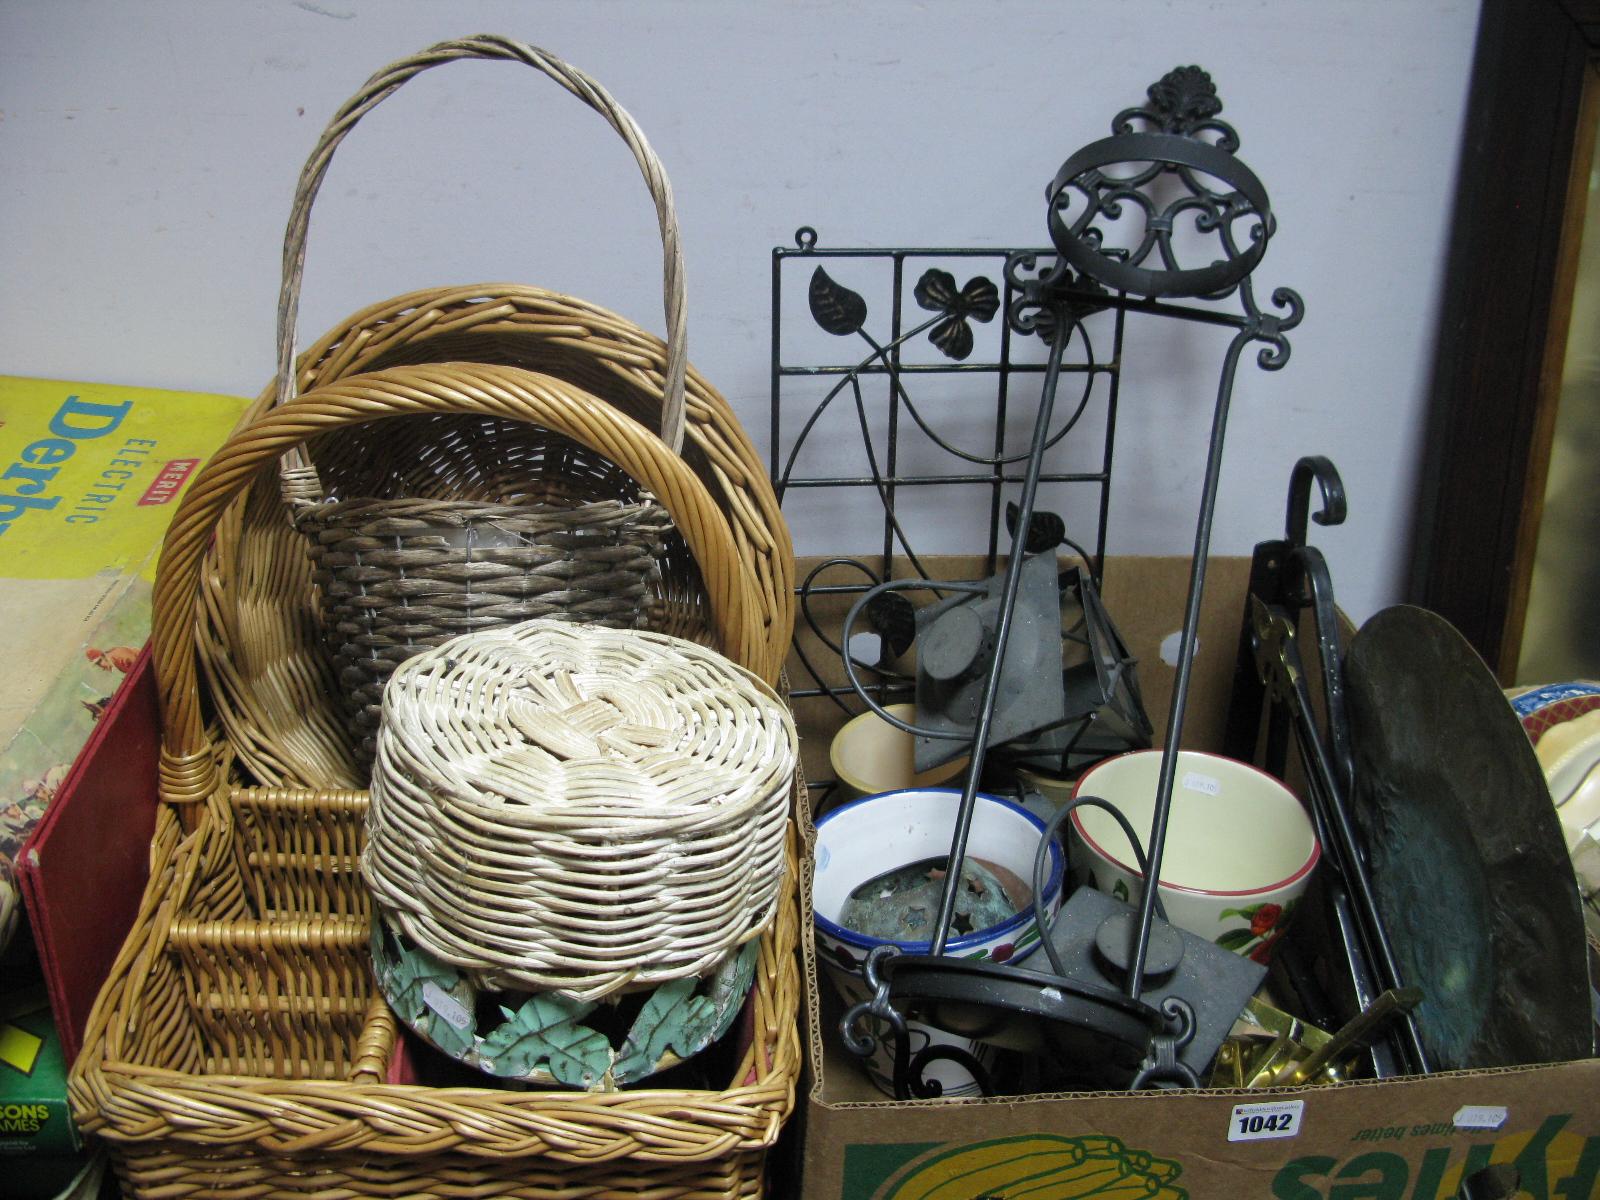 Lot 1042 - Plant Pot Holders, assorted baskets, brass door handles, brass charger, etc.